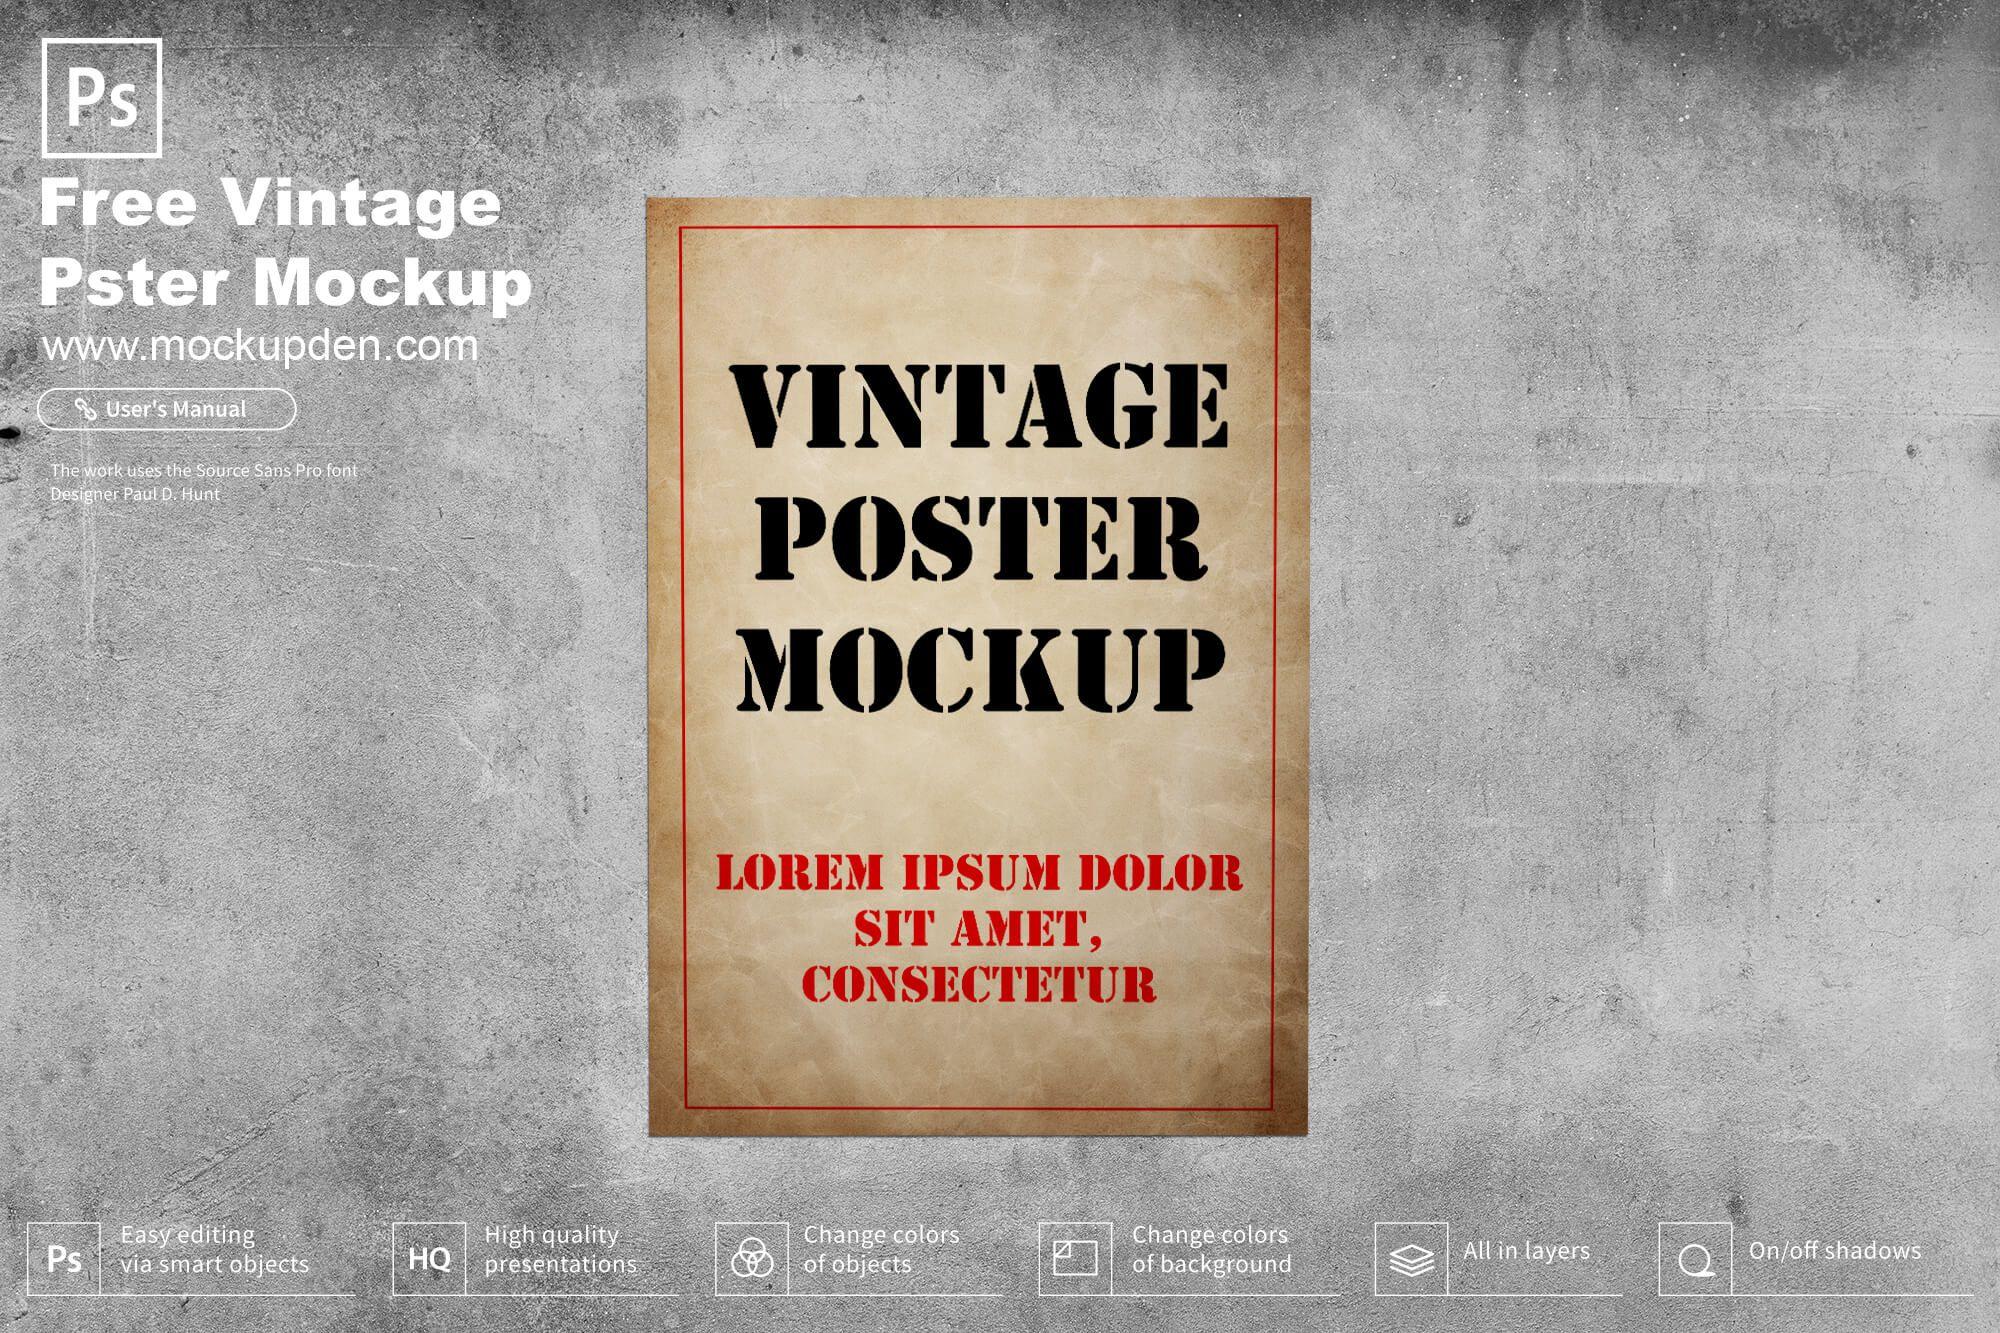 Free Vintage Poster Mockup Psd Template Poster Mockup Poster Mockup Psd Vintage Posters